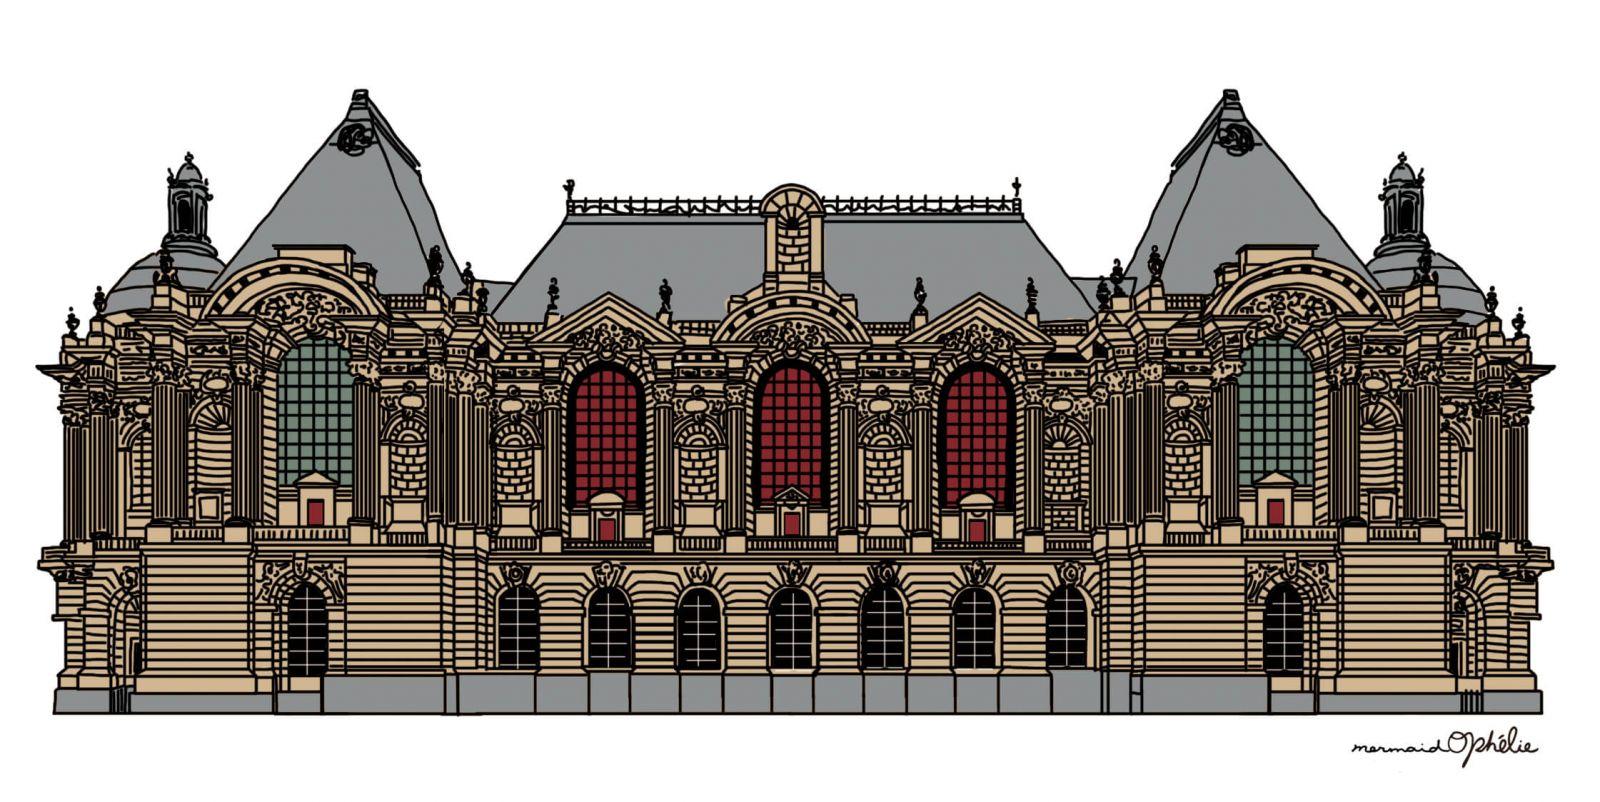 Macintosh HD:Users:apple:Desktop:在路上專欄:10-Palais des Beaux-Arts de Lille:10-2.jpg